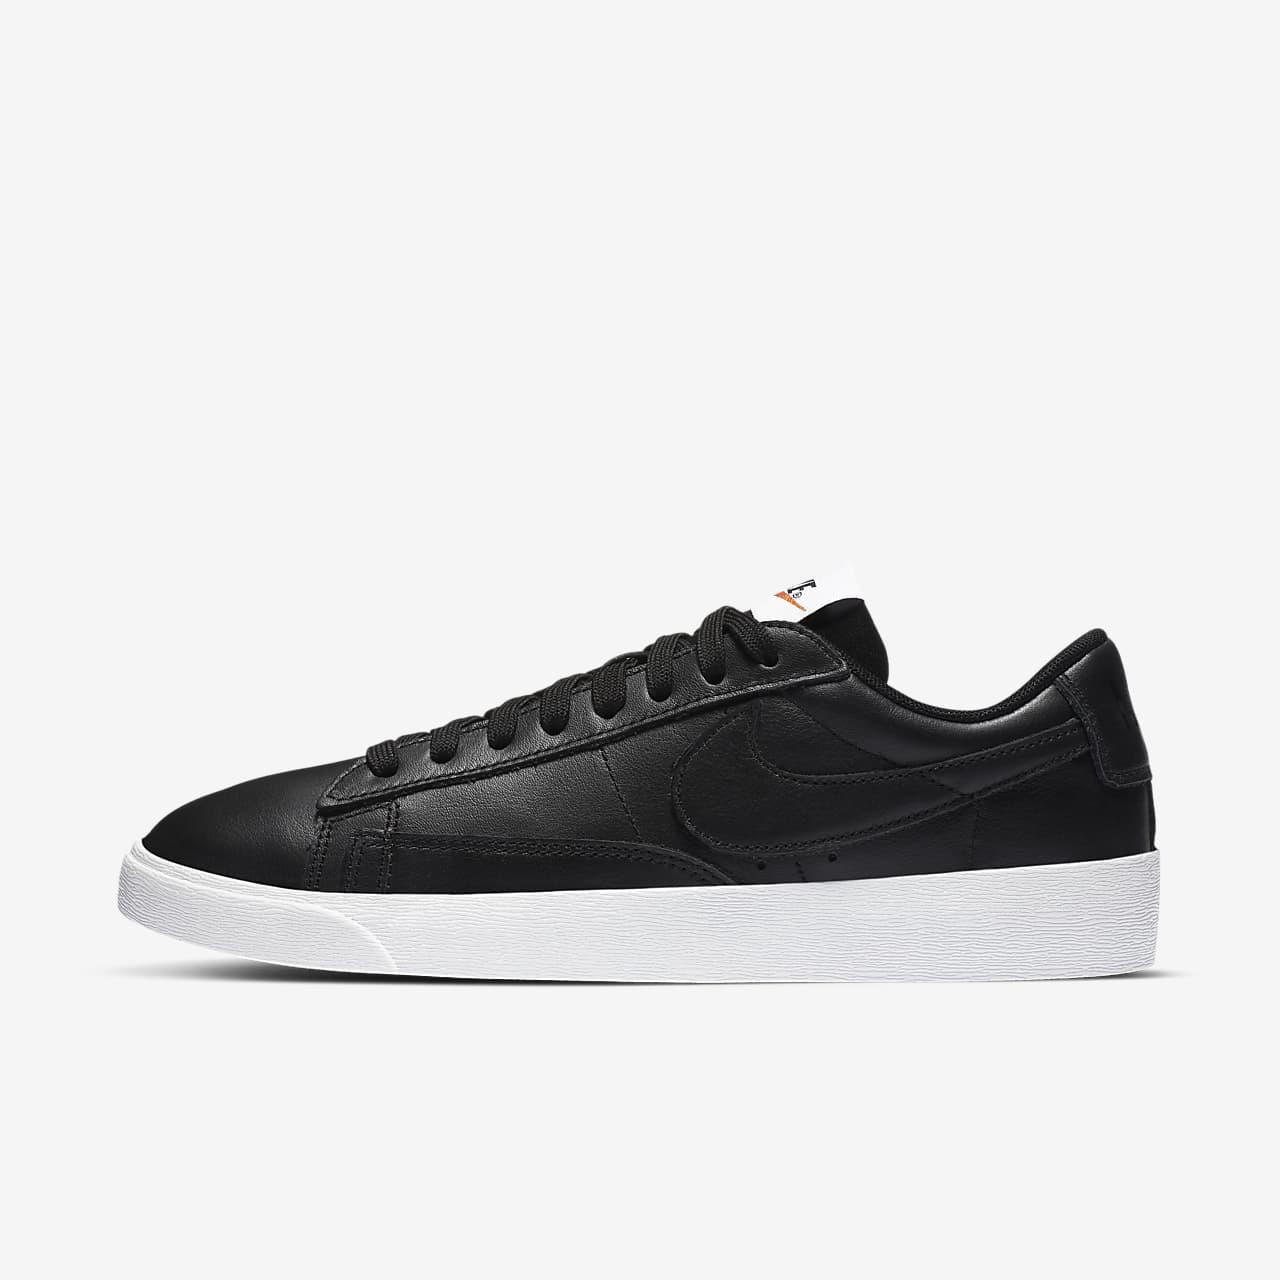 fa9147b9d3b2 Nike Blazer Low LE Women s Shoe. Nike.com